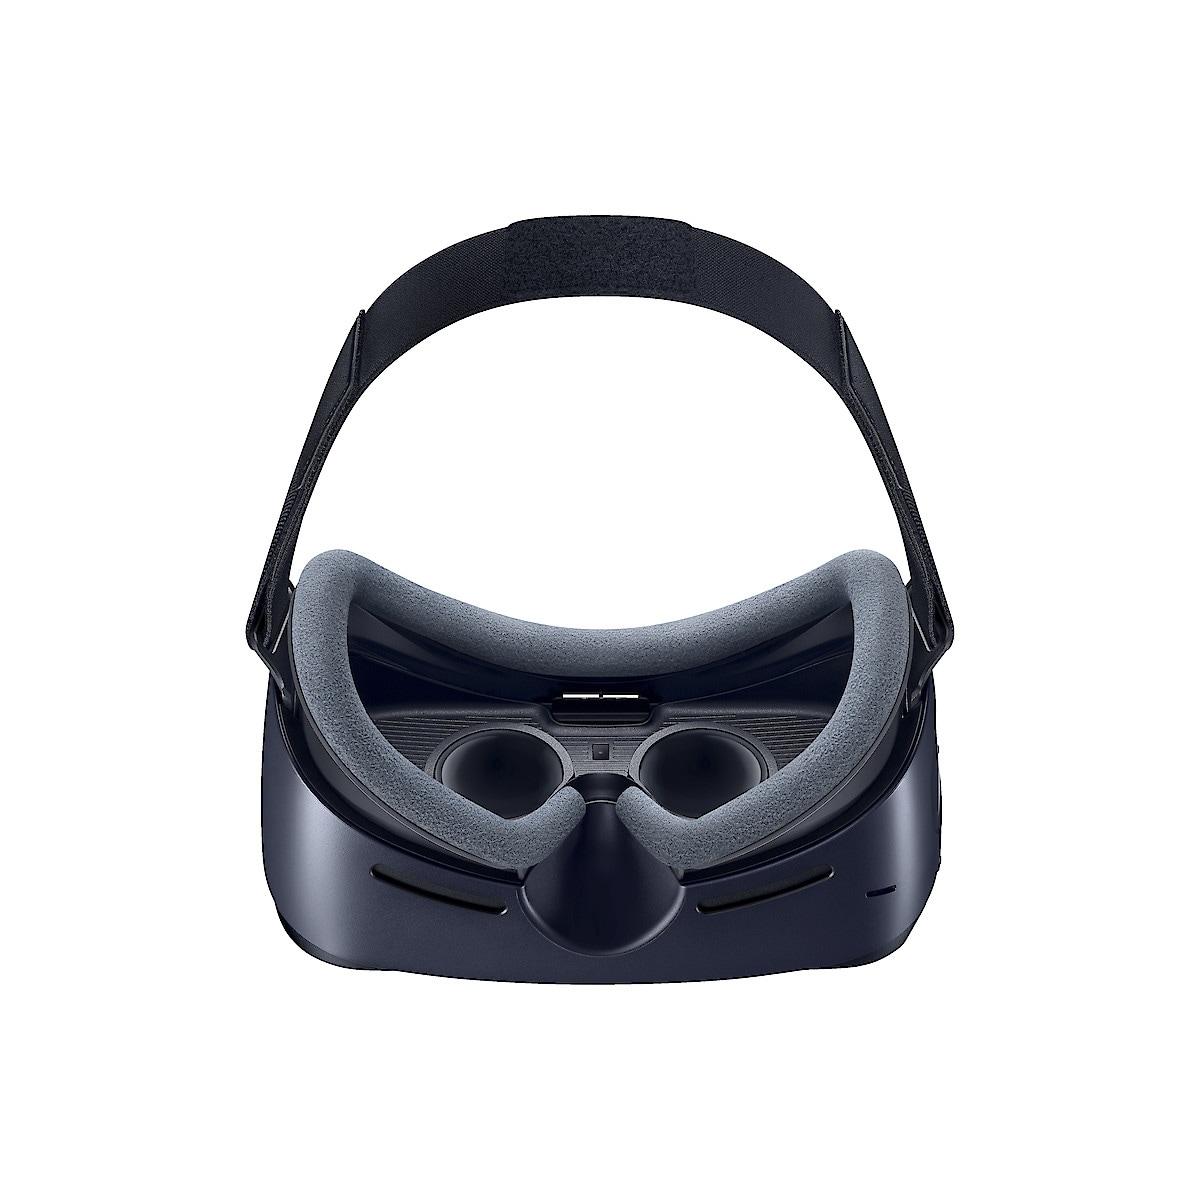 VR-glasögon för smartphone, Samsung VR Gear 2016 EDT, SM-R323